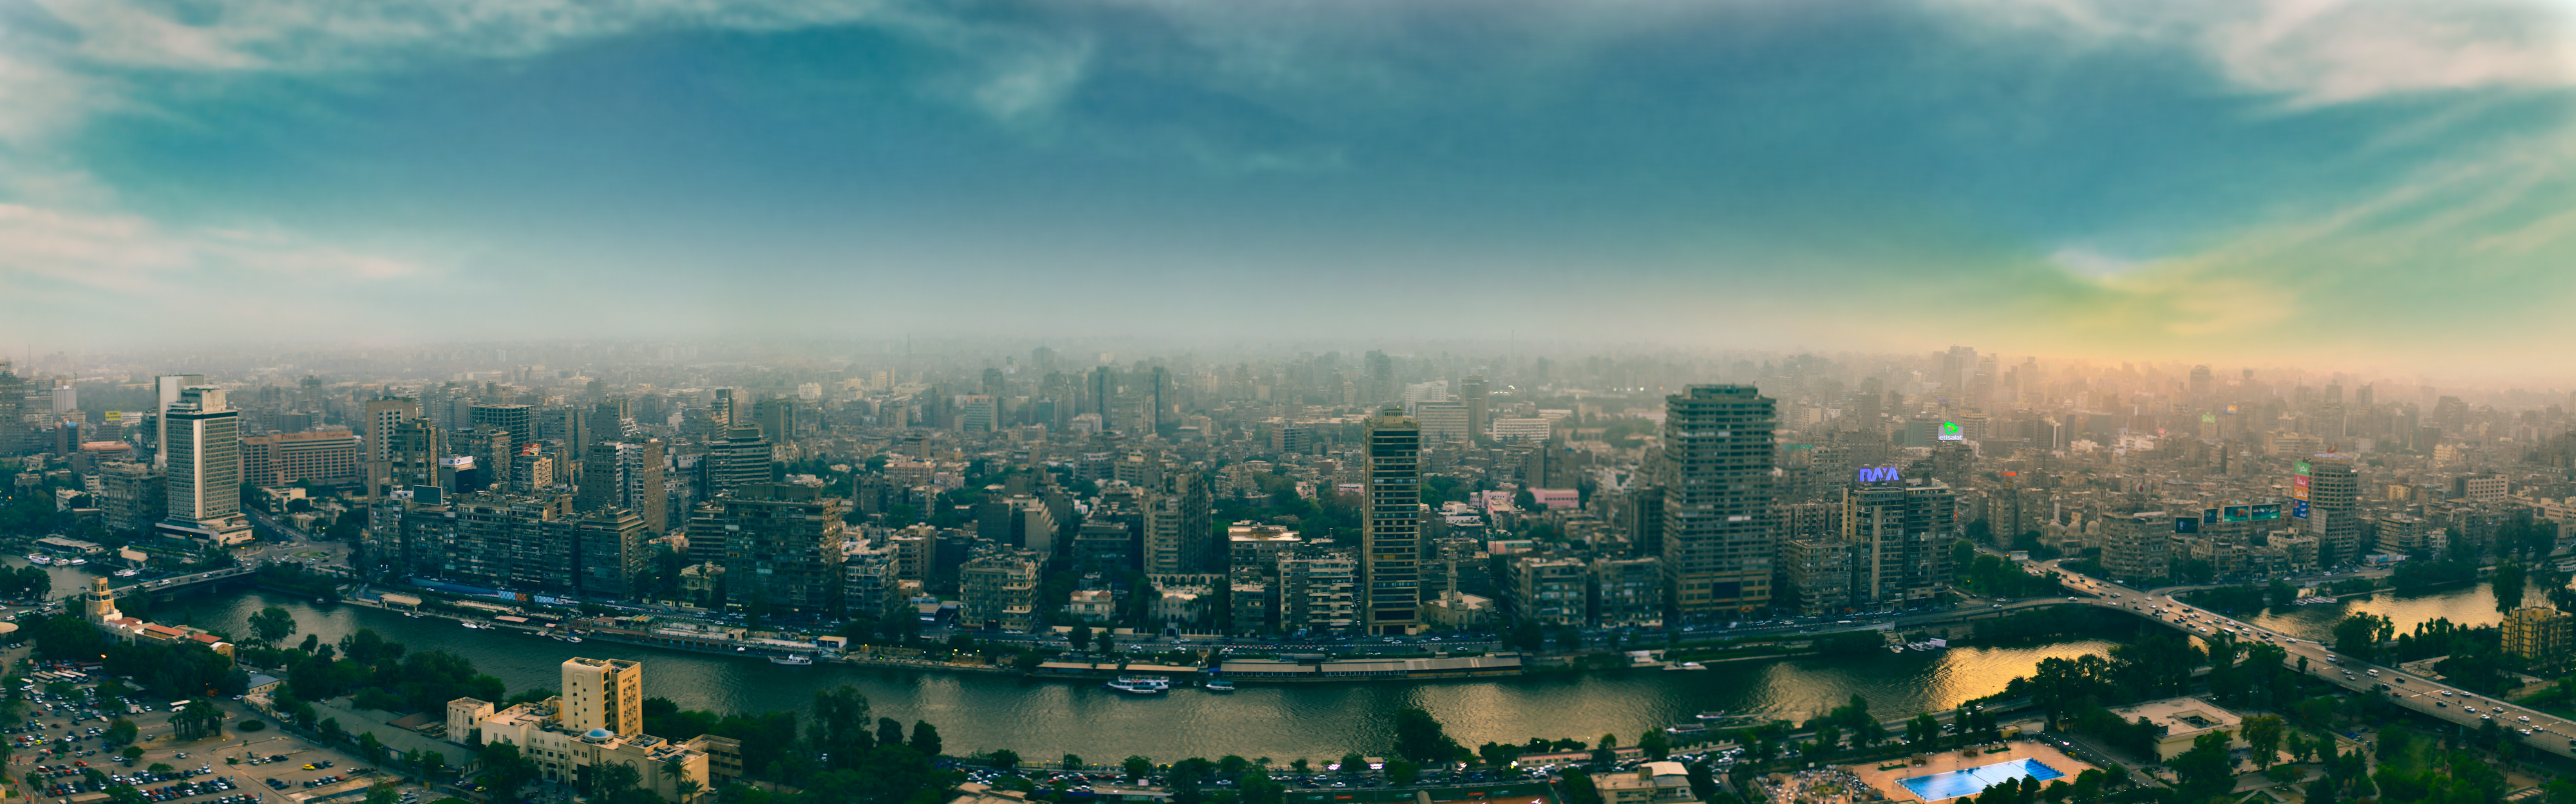 [✔] République arabe d'Égypte  جمهورية مصر العربية Cairo_panorama